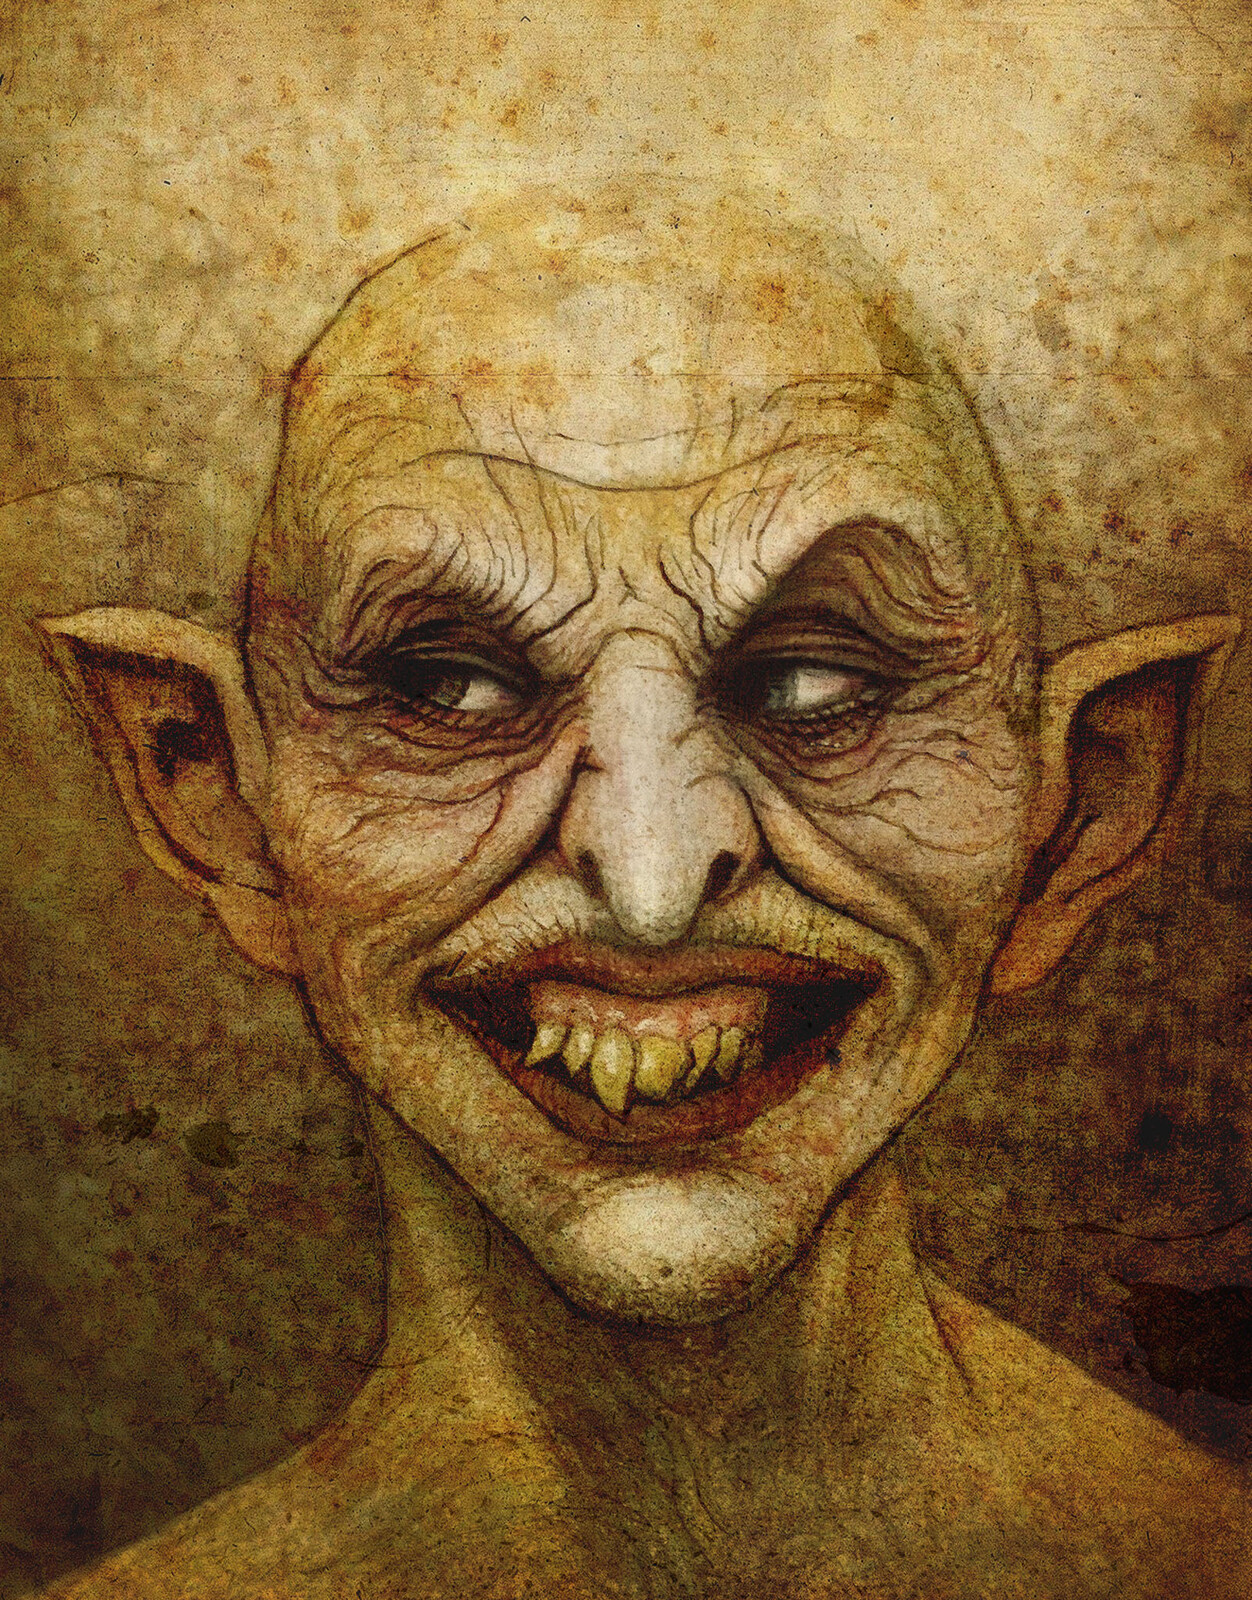 Just Another Nosferatu